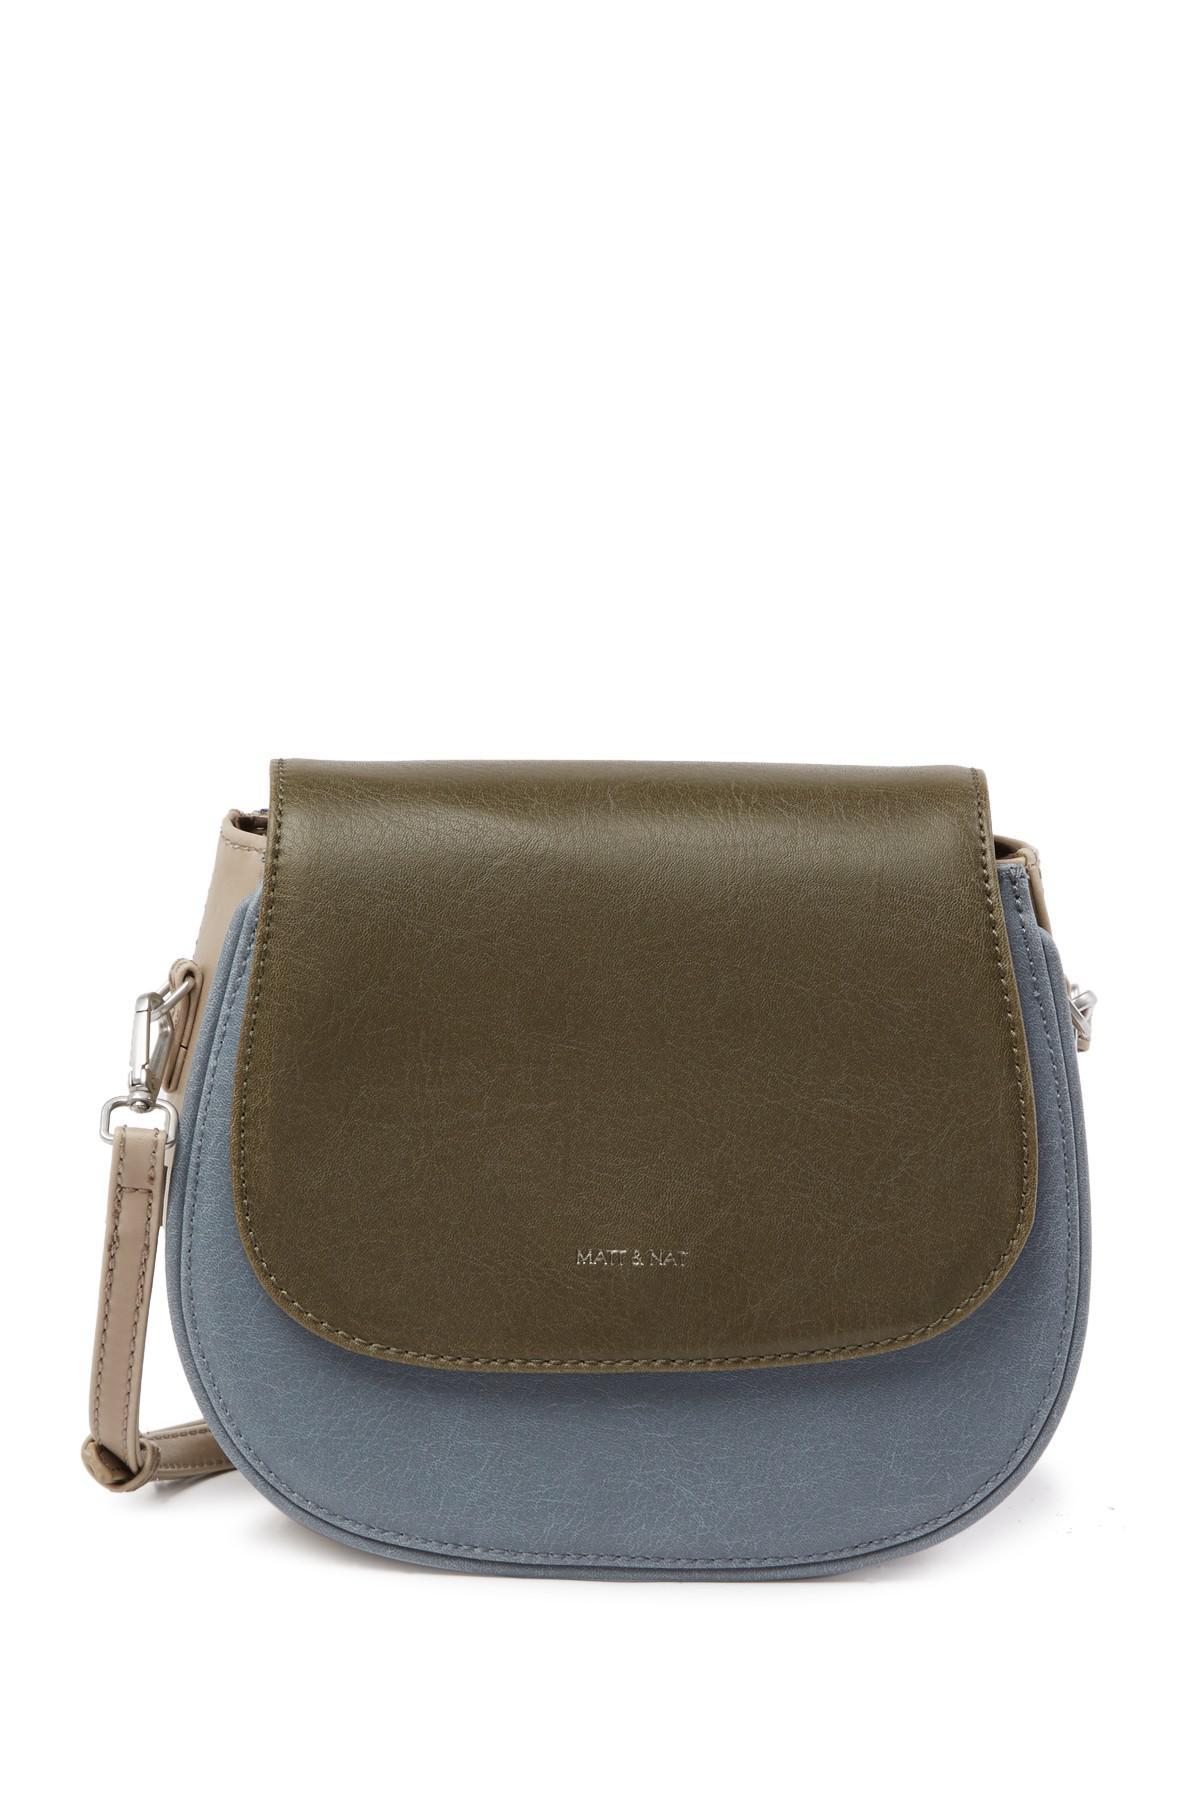 Lyst - Matt   Nat Rubicon Vegan Leather Crossbody Bag e5e86a98d652d